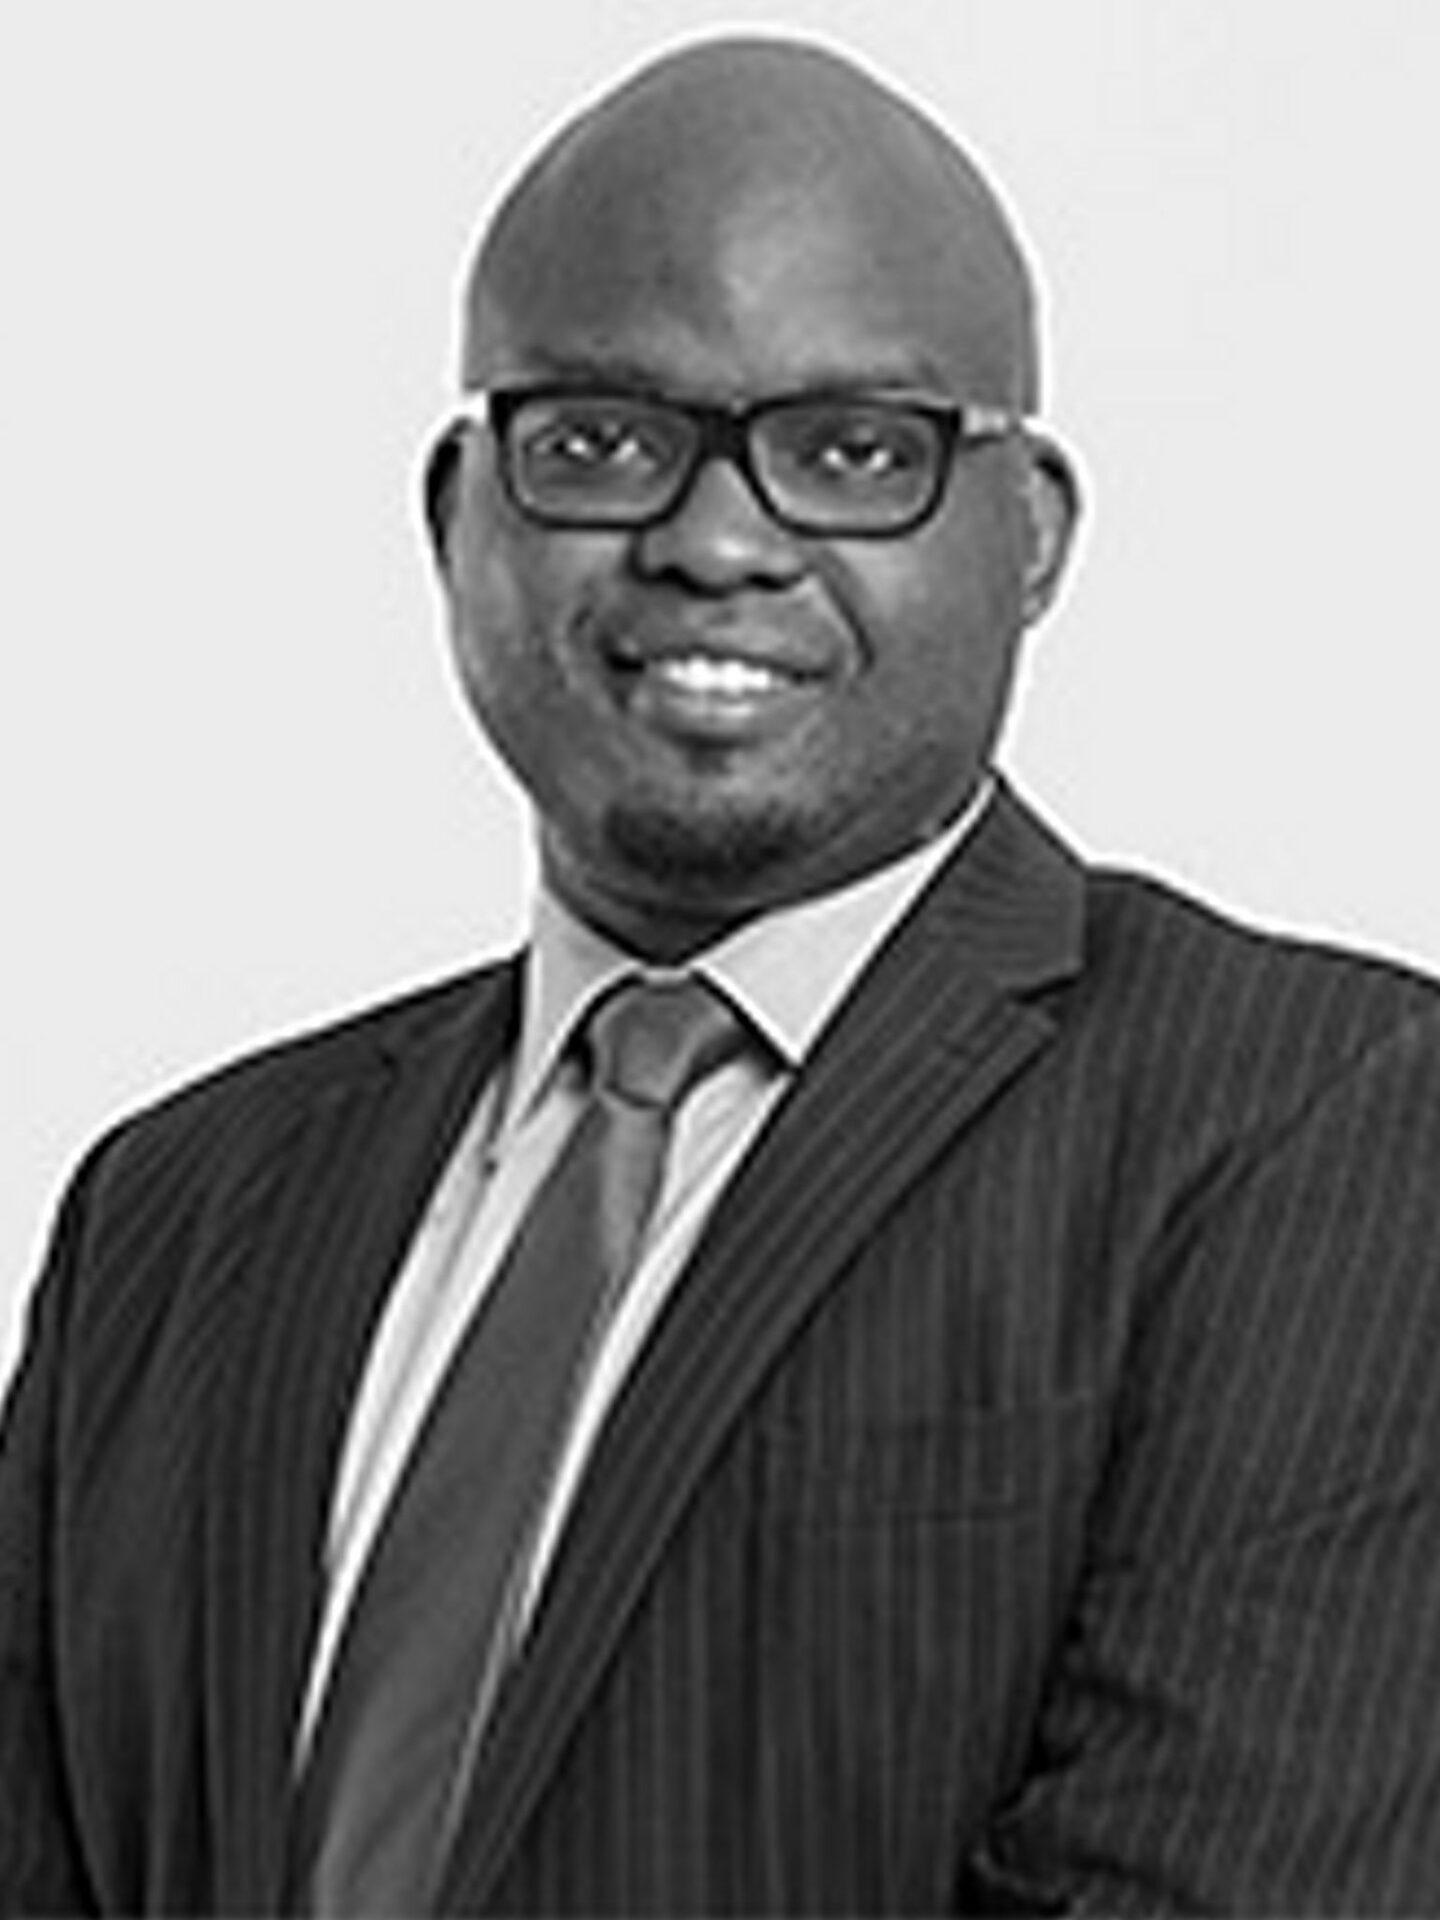 Konga: Former CFO succeeds Shagaya as CEO